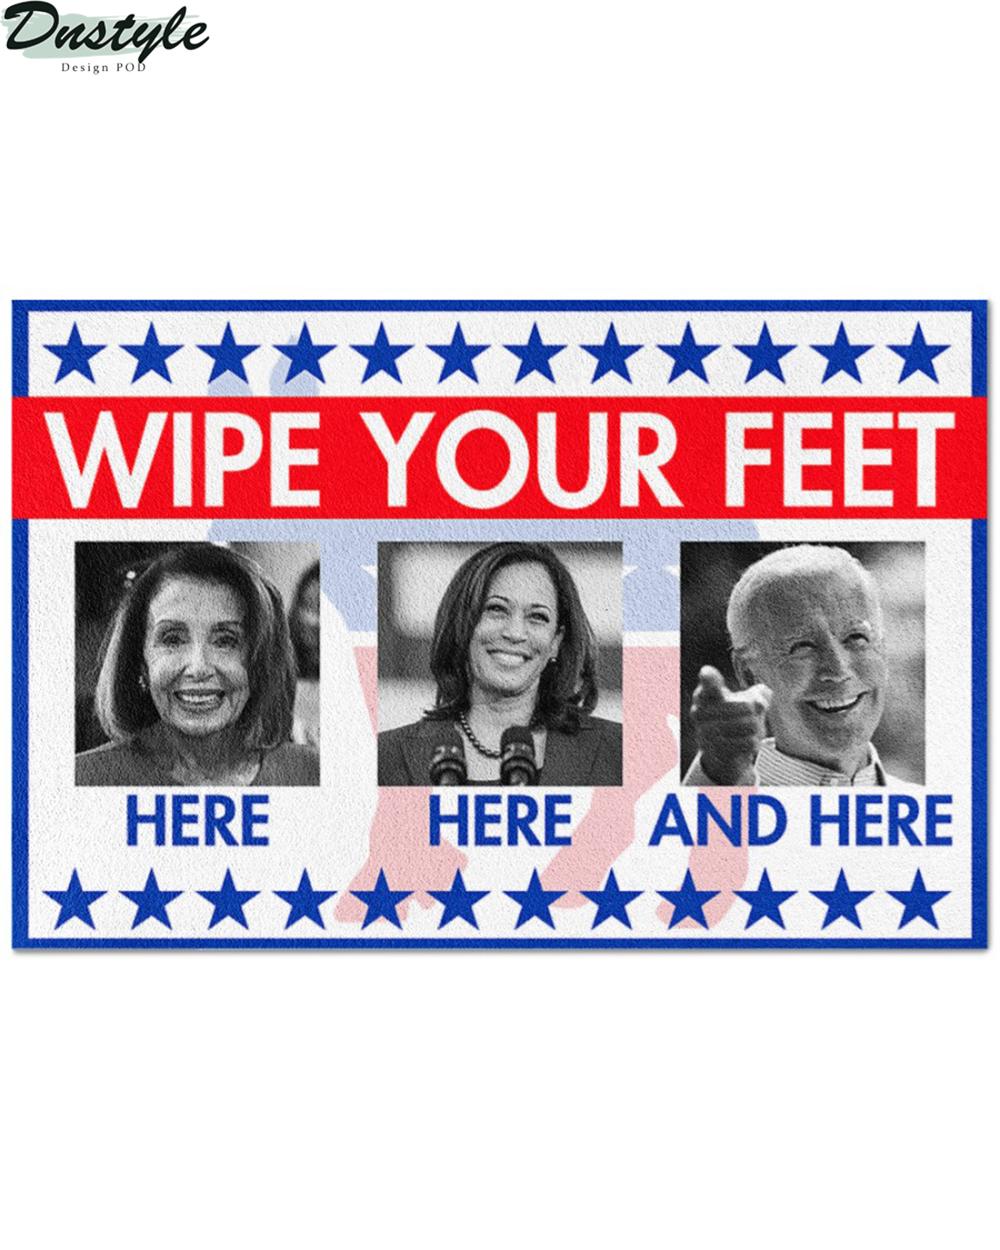 Biden and Kamala Harris wipe your feet here here and here doormat